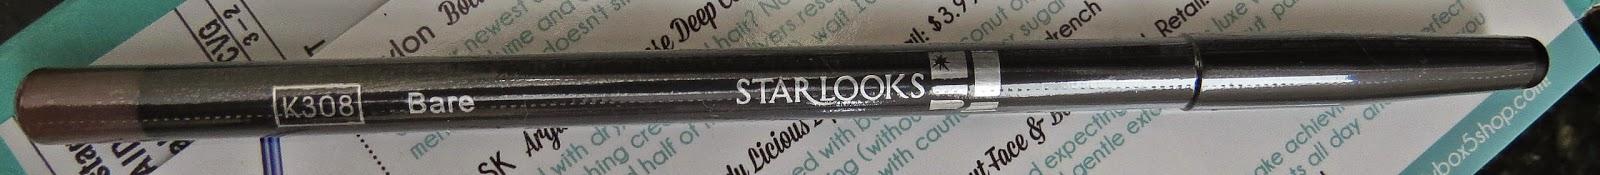 Starlooks Lip Liner